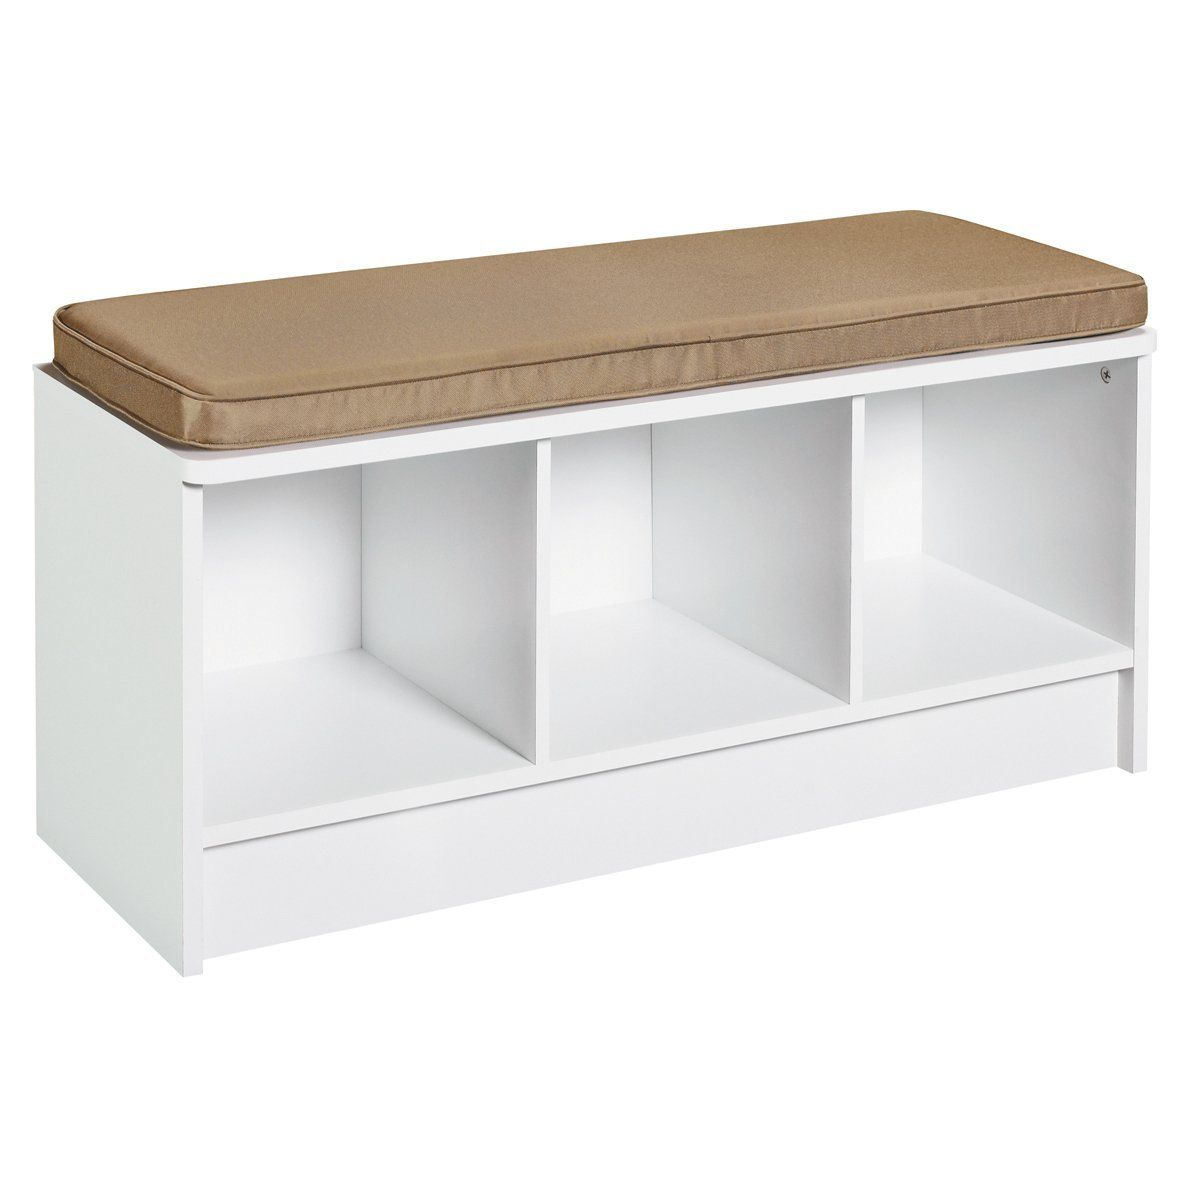 Amazon Com Closetmaid 1569 Cubeicals 3 Cube Storage Bench White